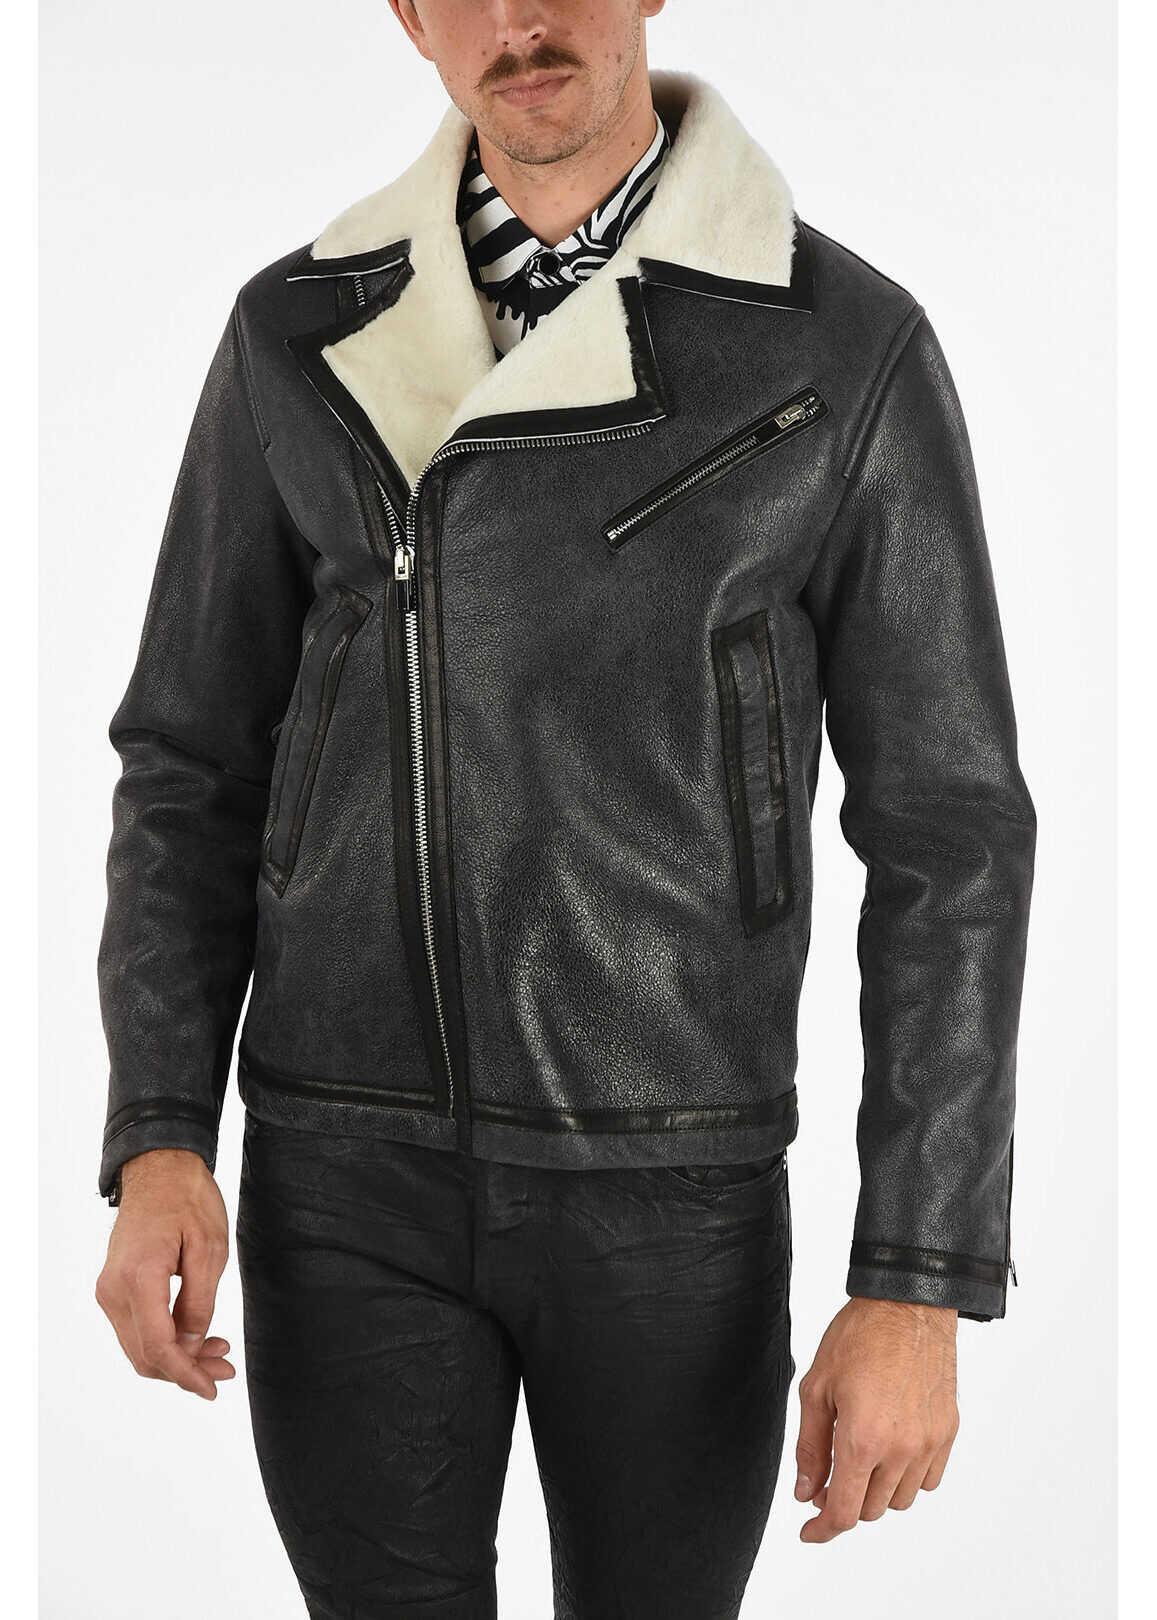 Just Cavalli Leather Biker Jacket GRAY imagine